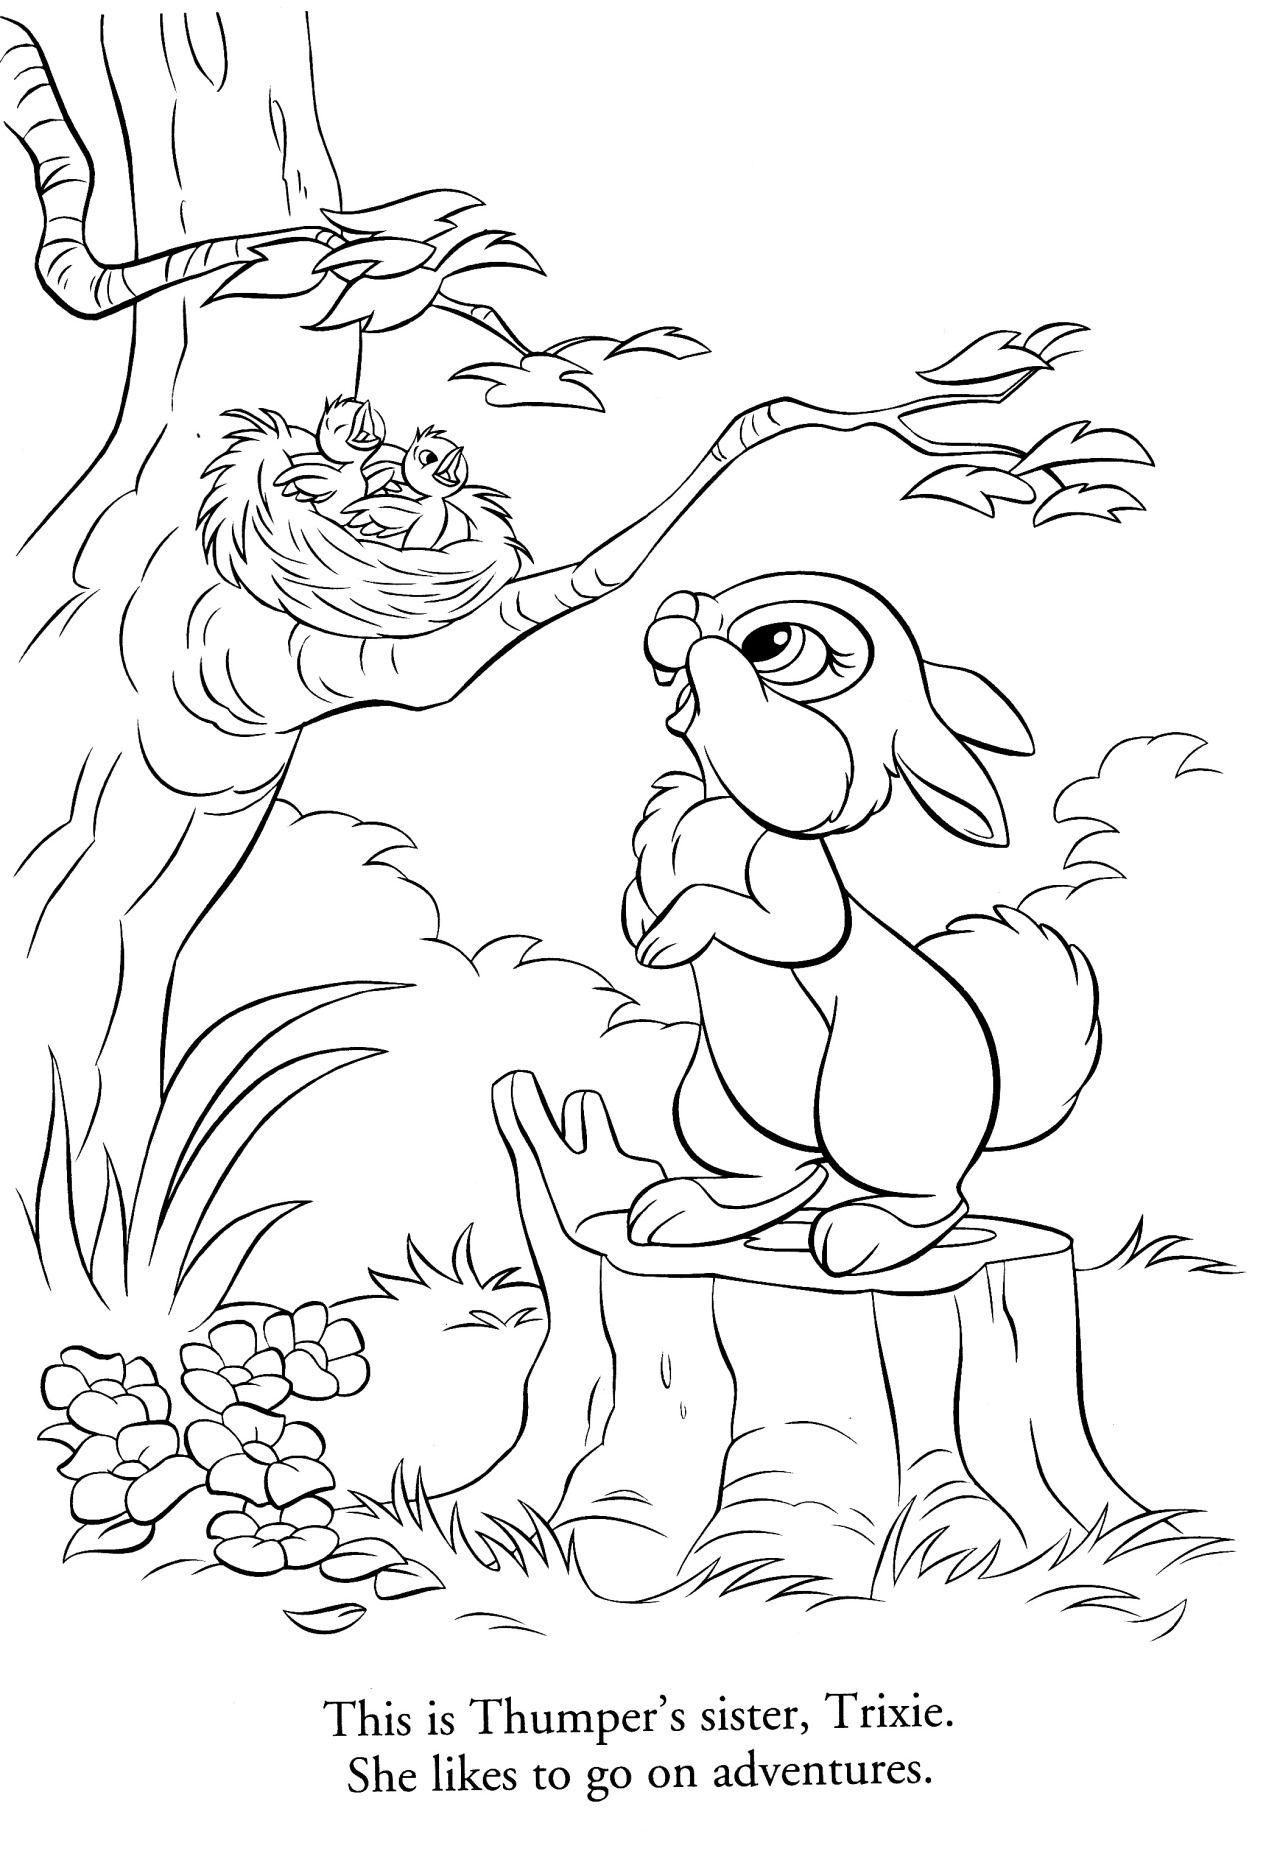 Disney Coloring Pages : Photo | para colorear | Pinterest | Dibujos ...